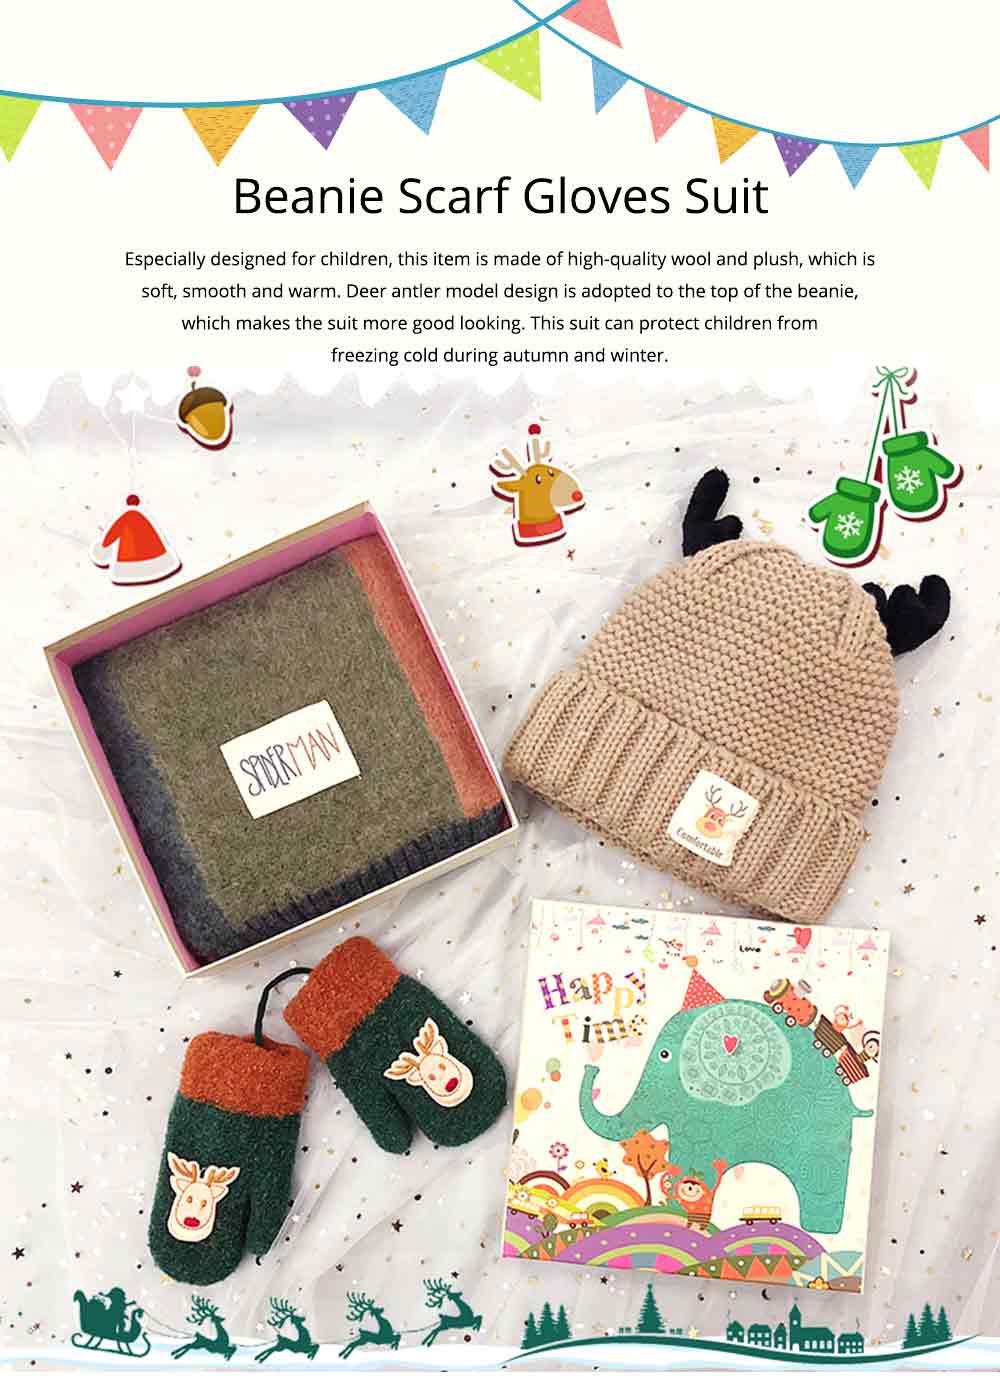 Cute Warm Children Deer Antler Beanie Cap Scarf Gloves 3 PCS Suit, Elegant Cartoon Animal Sewing Autumn Winter Christmas Accessories Set for Children 0